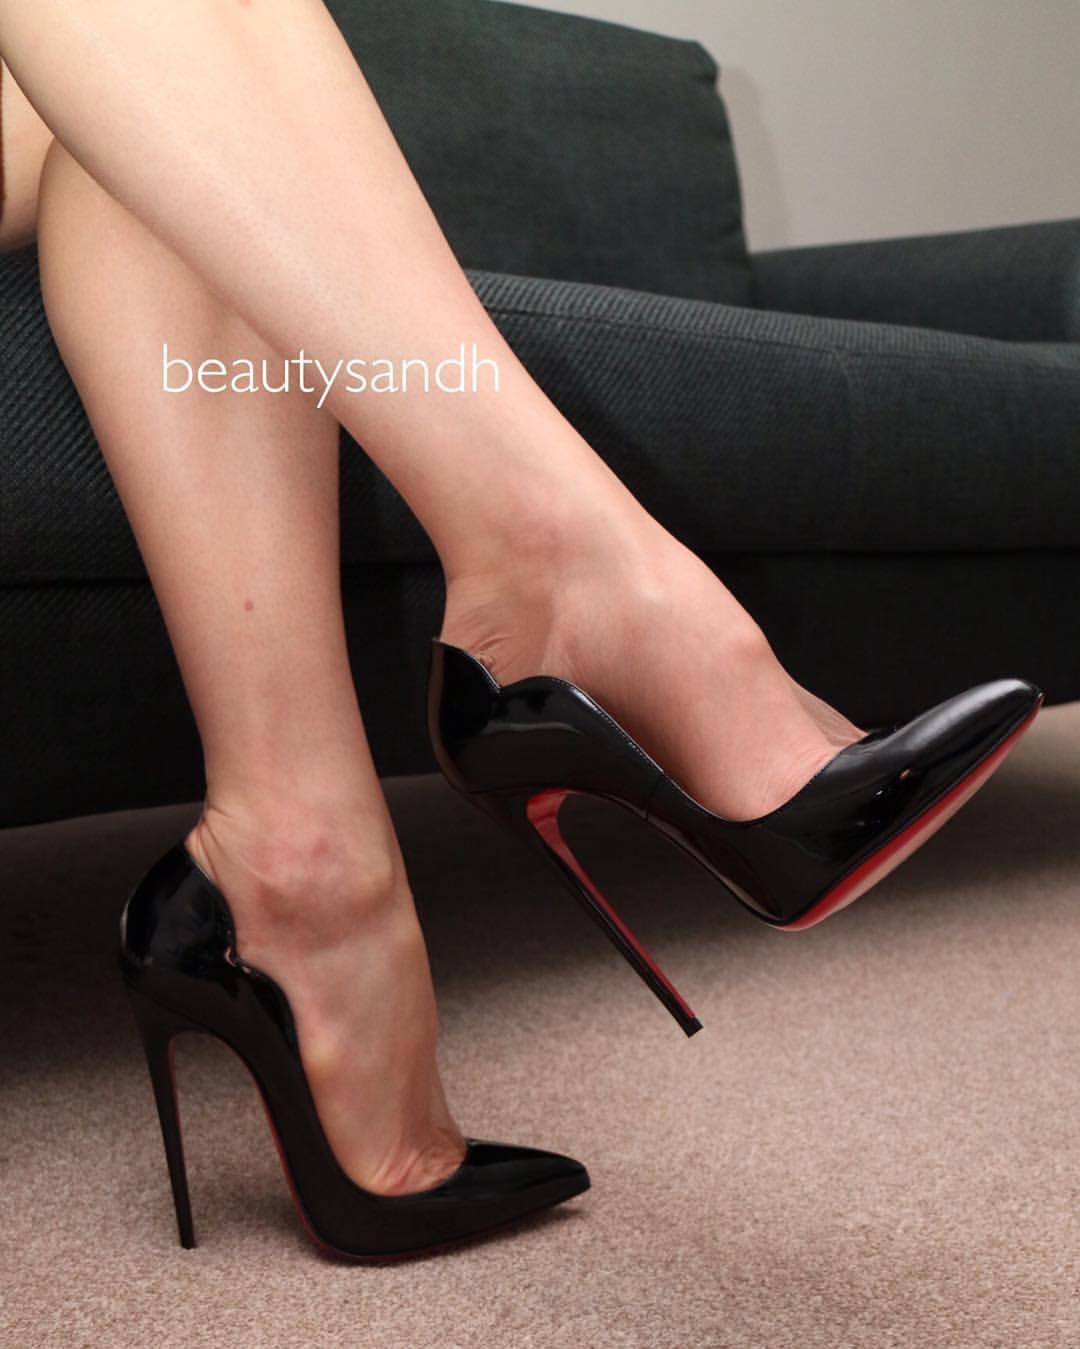 6033d6b8aa1  louboutin  hotchick  hotchick130  louboutinhotchick  legs  stockings   fullyfashioned  nylons  toecleavage  higharches  longlegs  tanstockings   redsoles ...